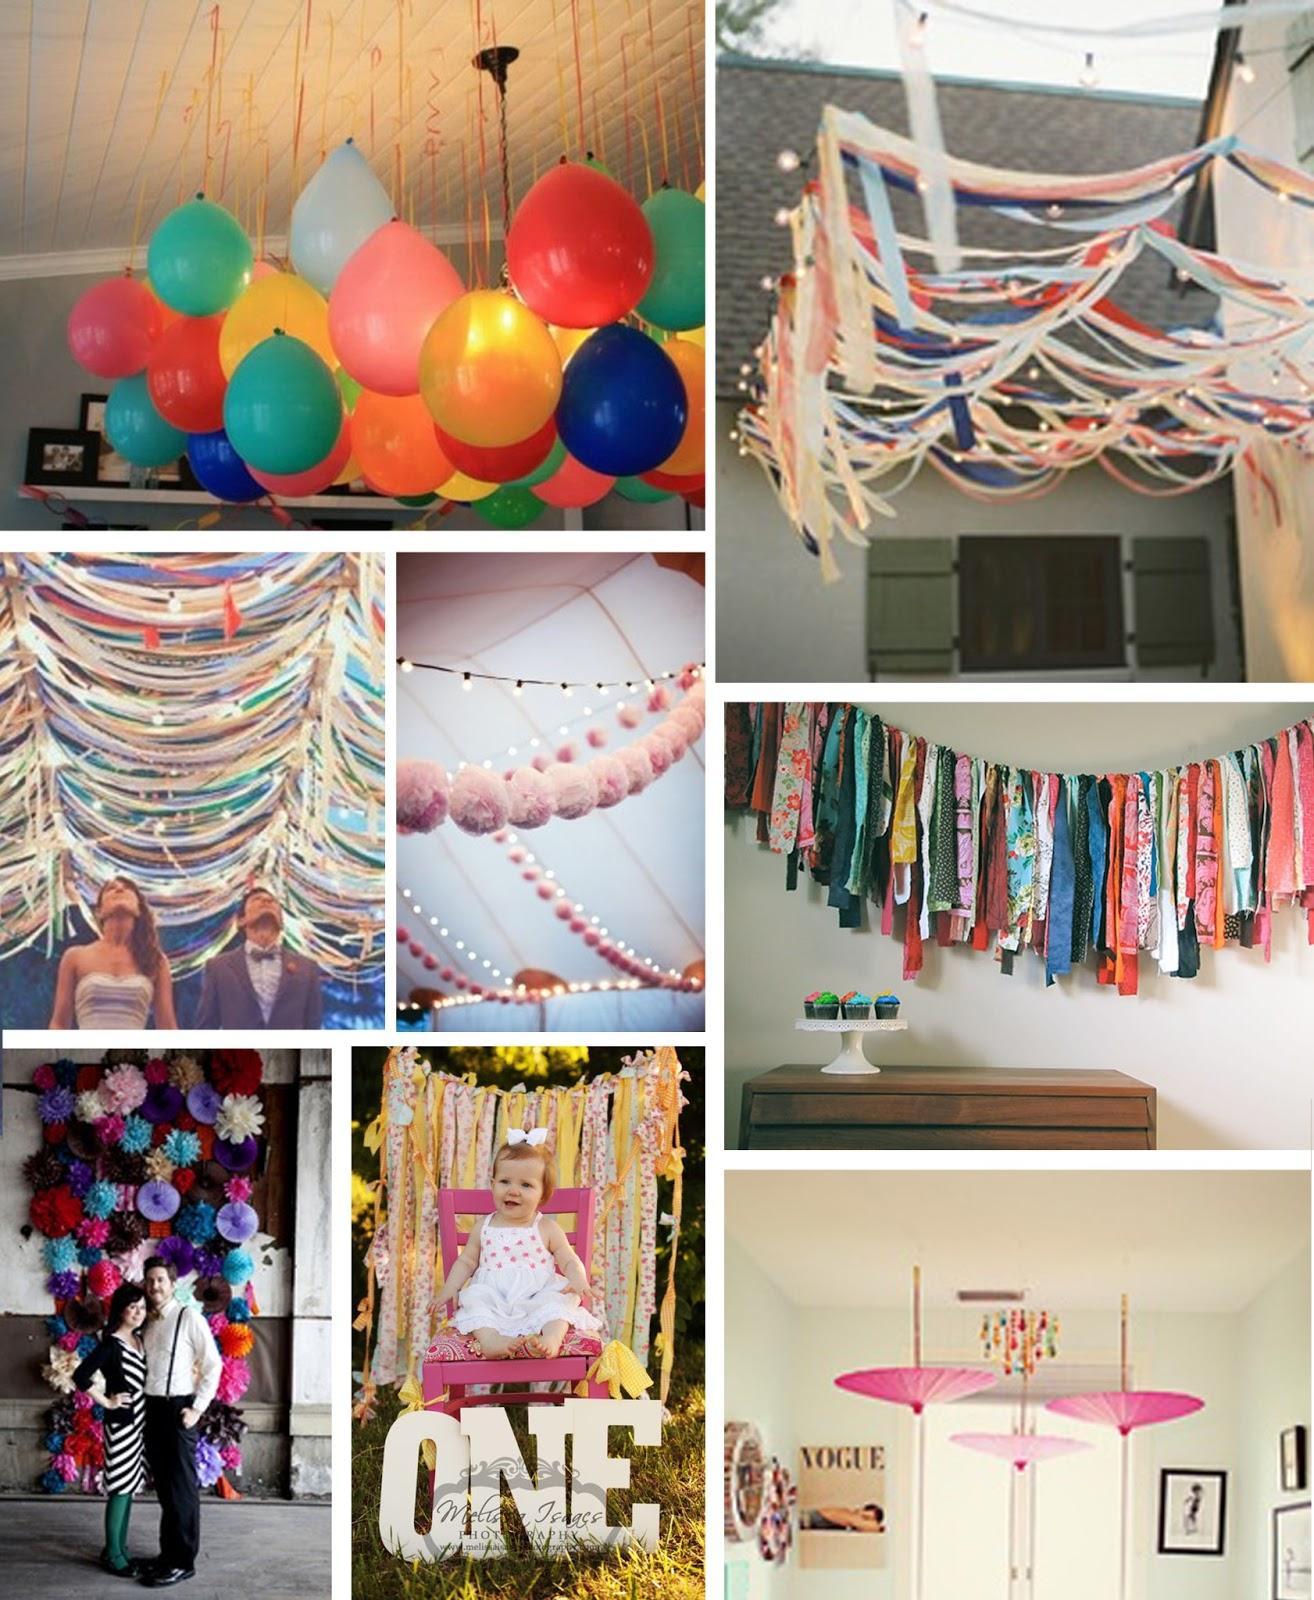 Detalles para una fiesta infantil paperblog for Guirnaldas para fiestas infantiles